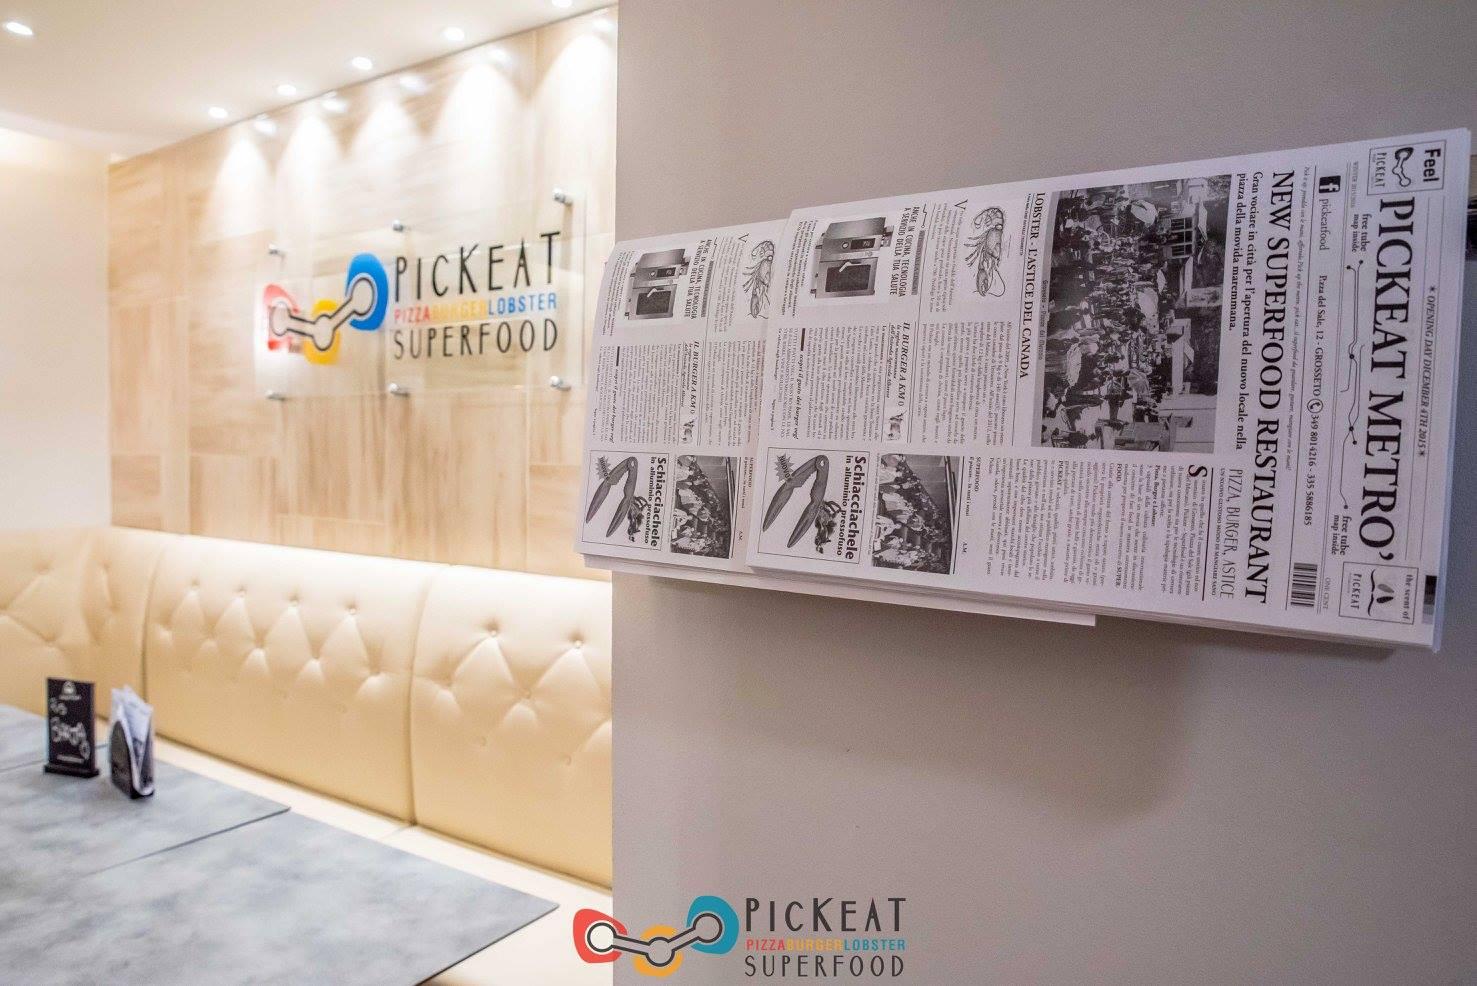 aironic_ugo_capparelli_interior_design_pickeat4